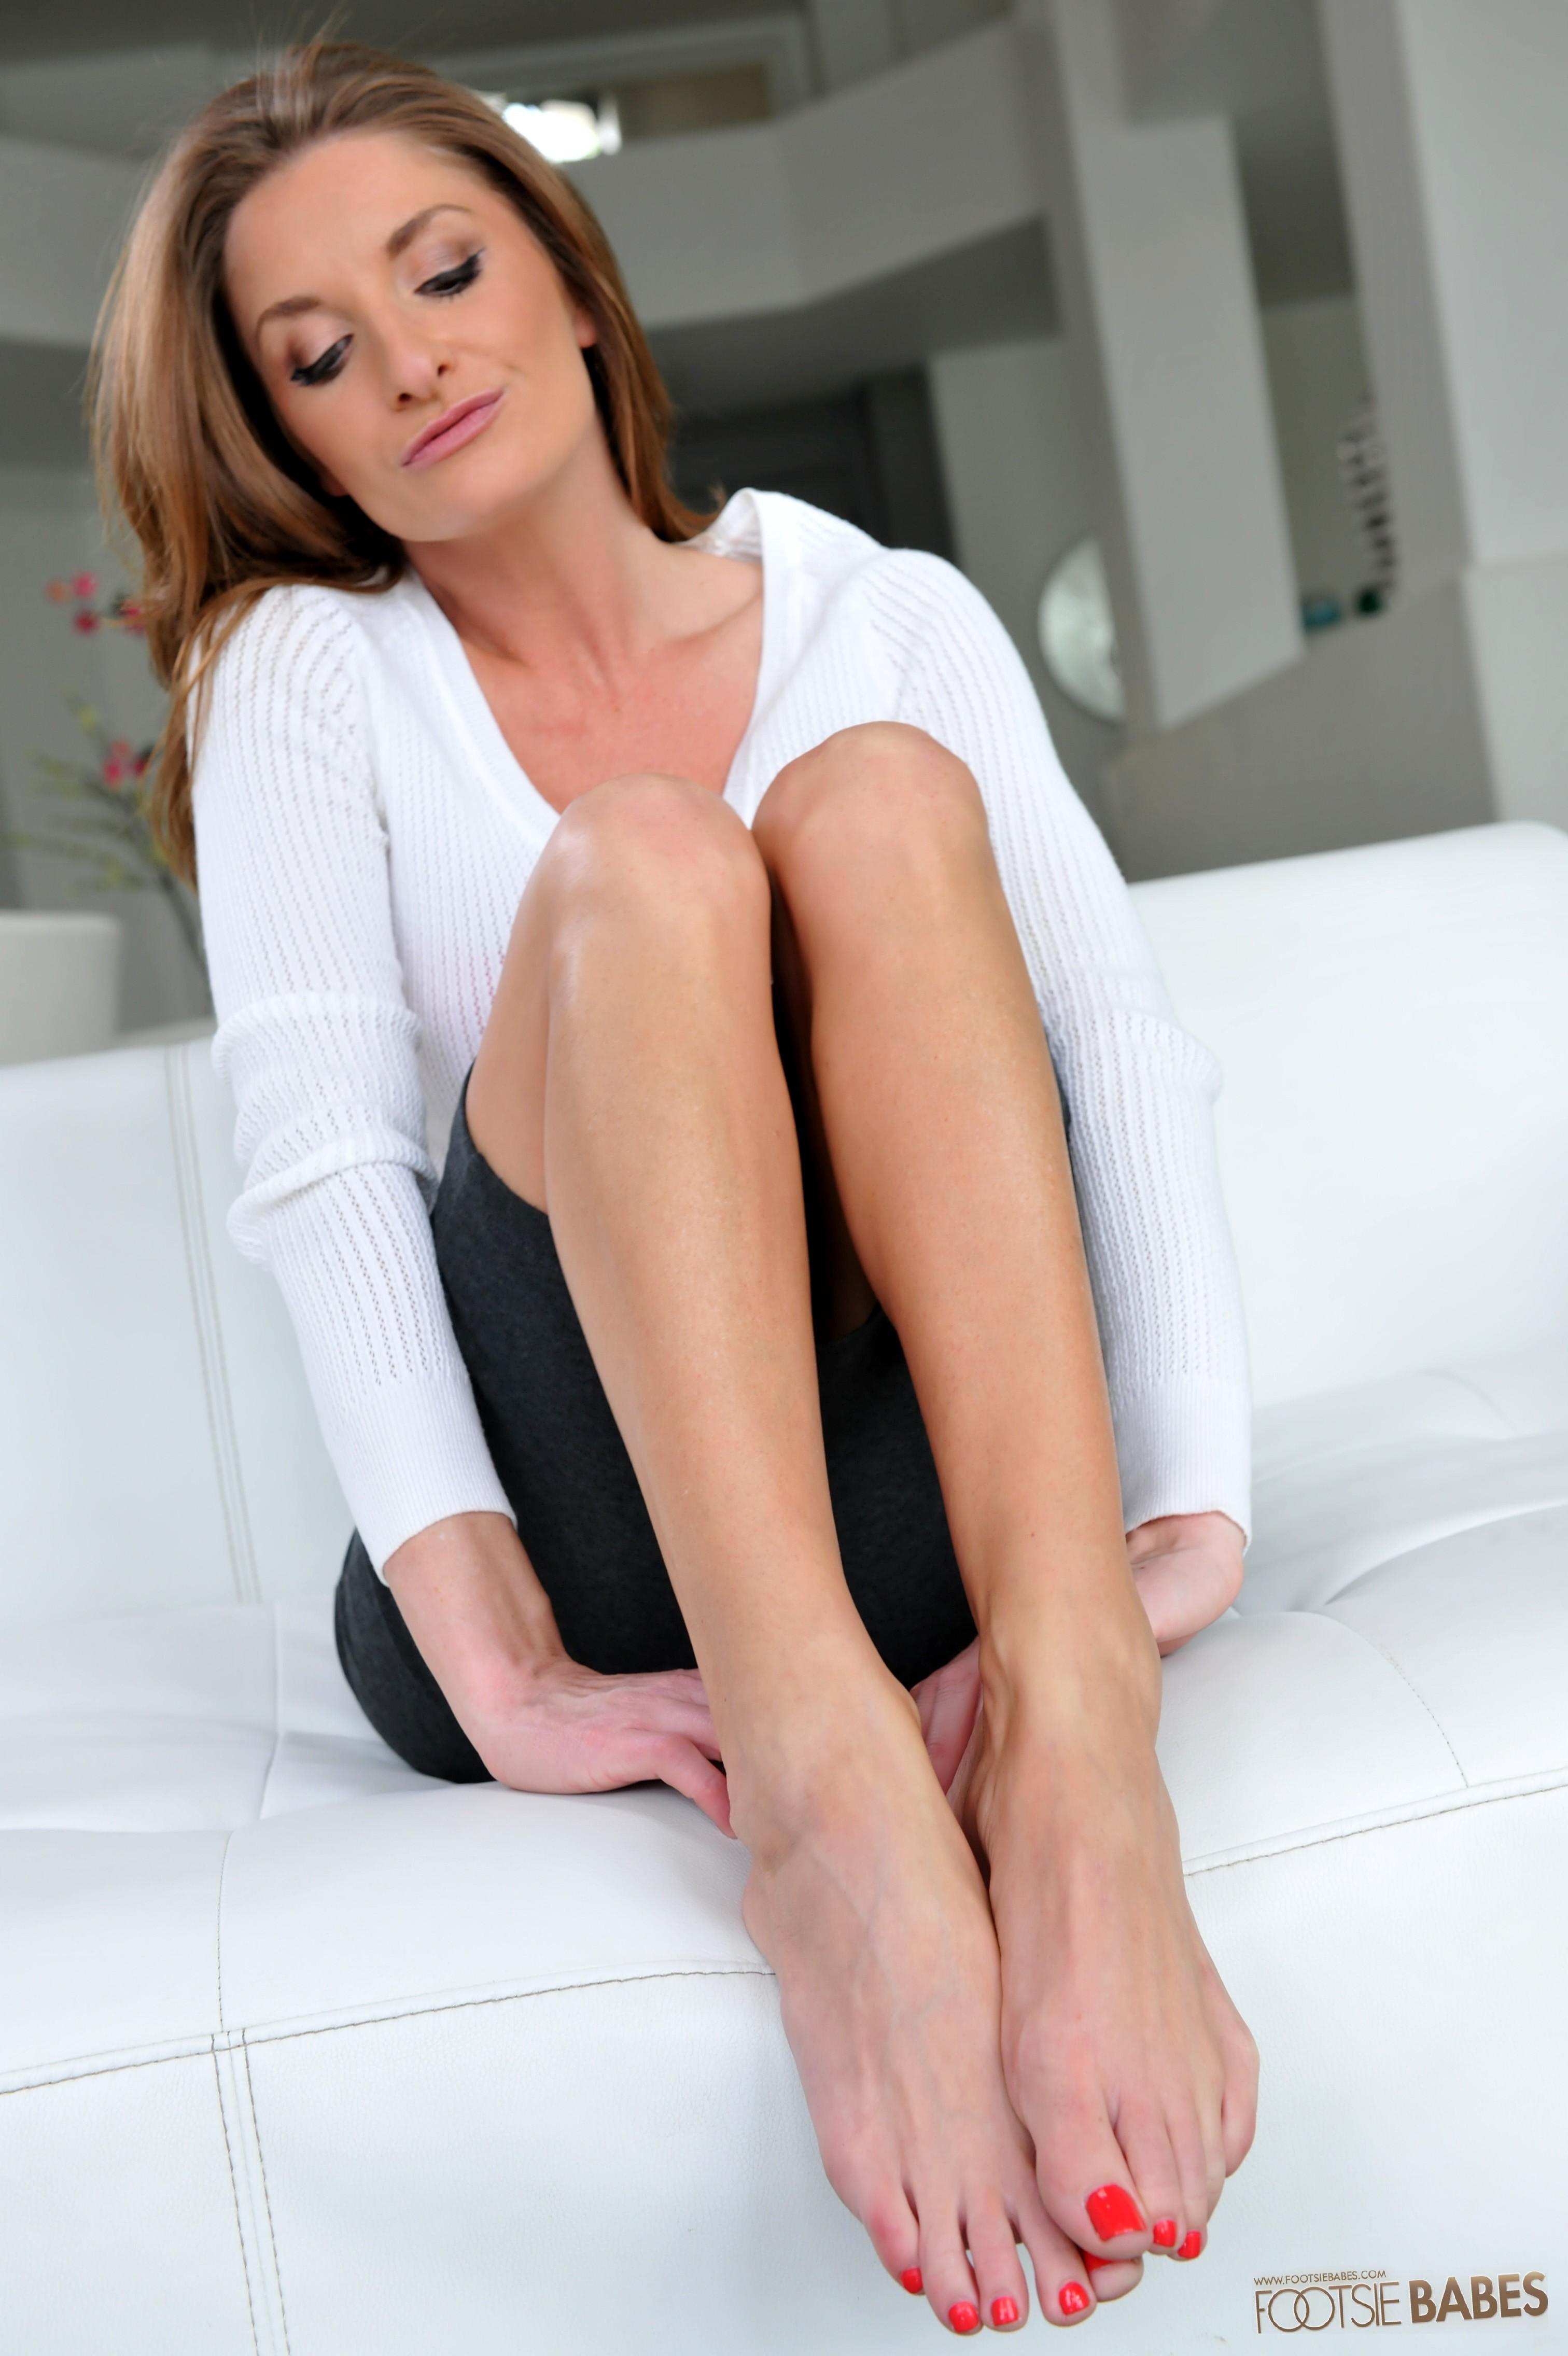 silvia saige's feet << wikifeet